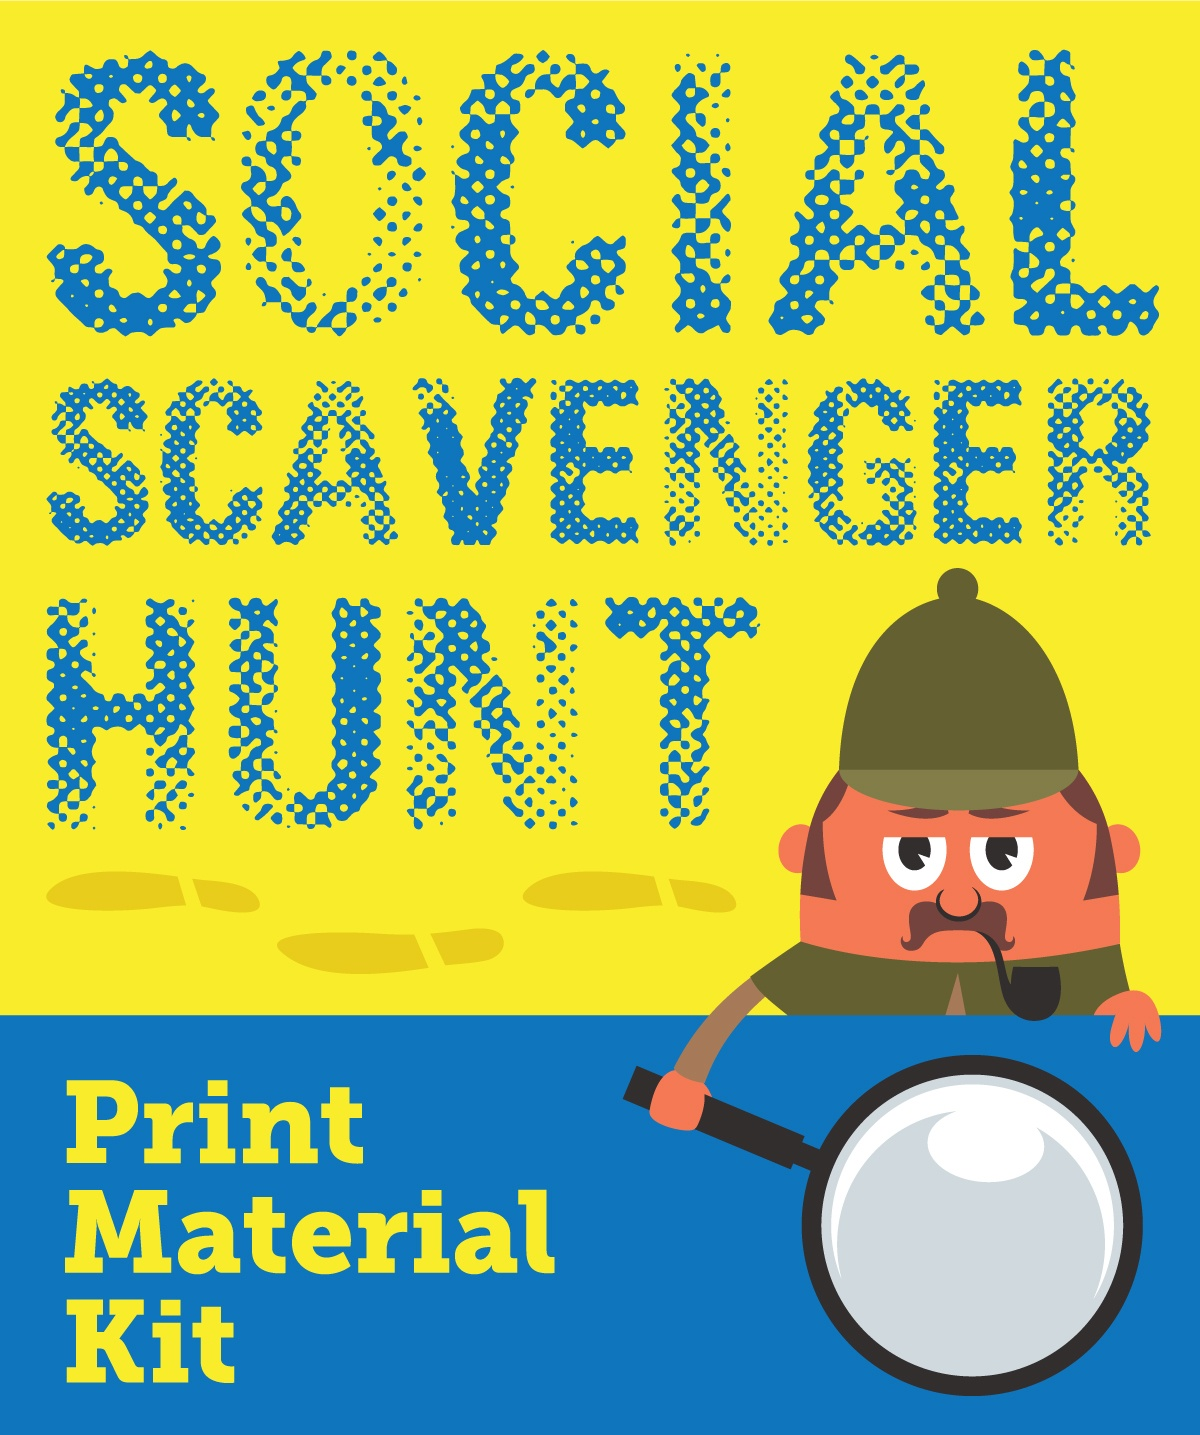 Download: print kit